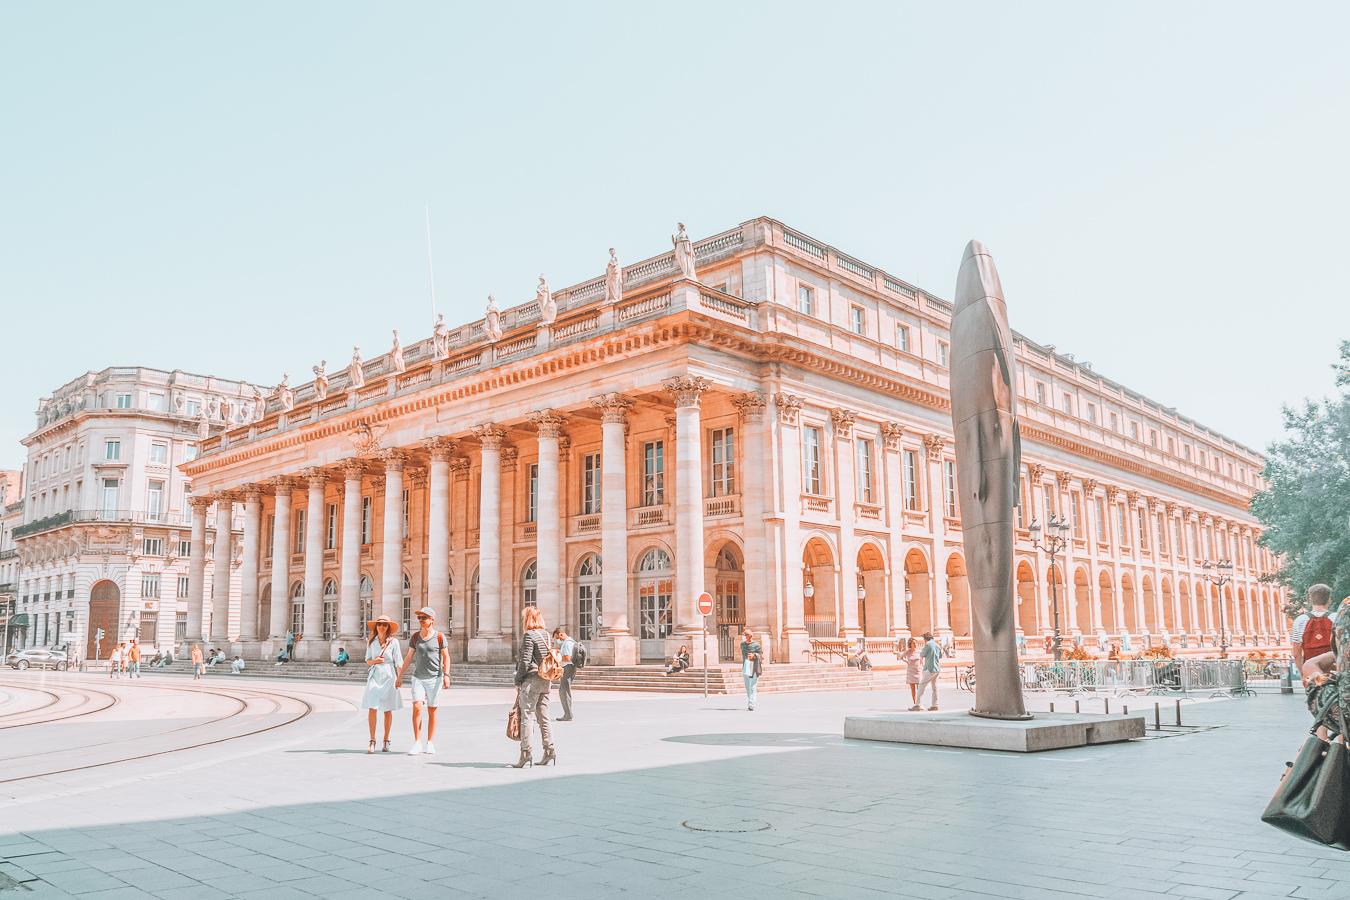 Building in Bordeaux